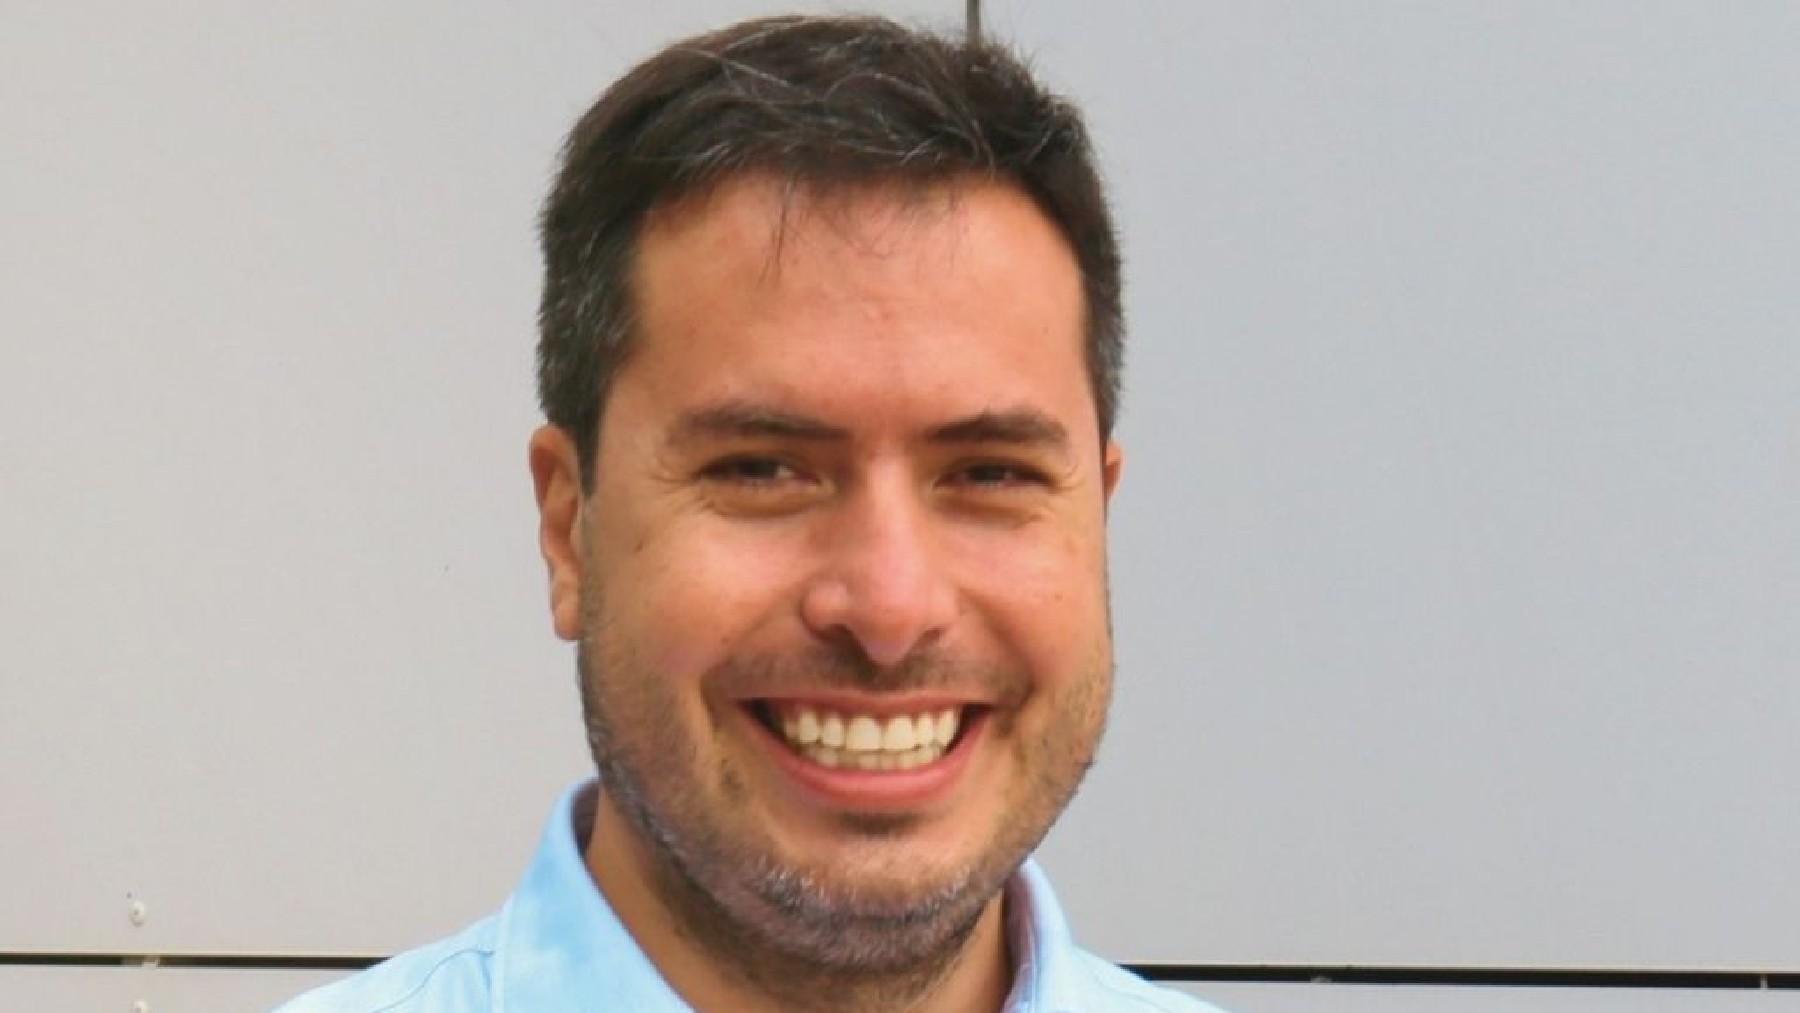 Julián Pardo, new growth director of habitissimo